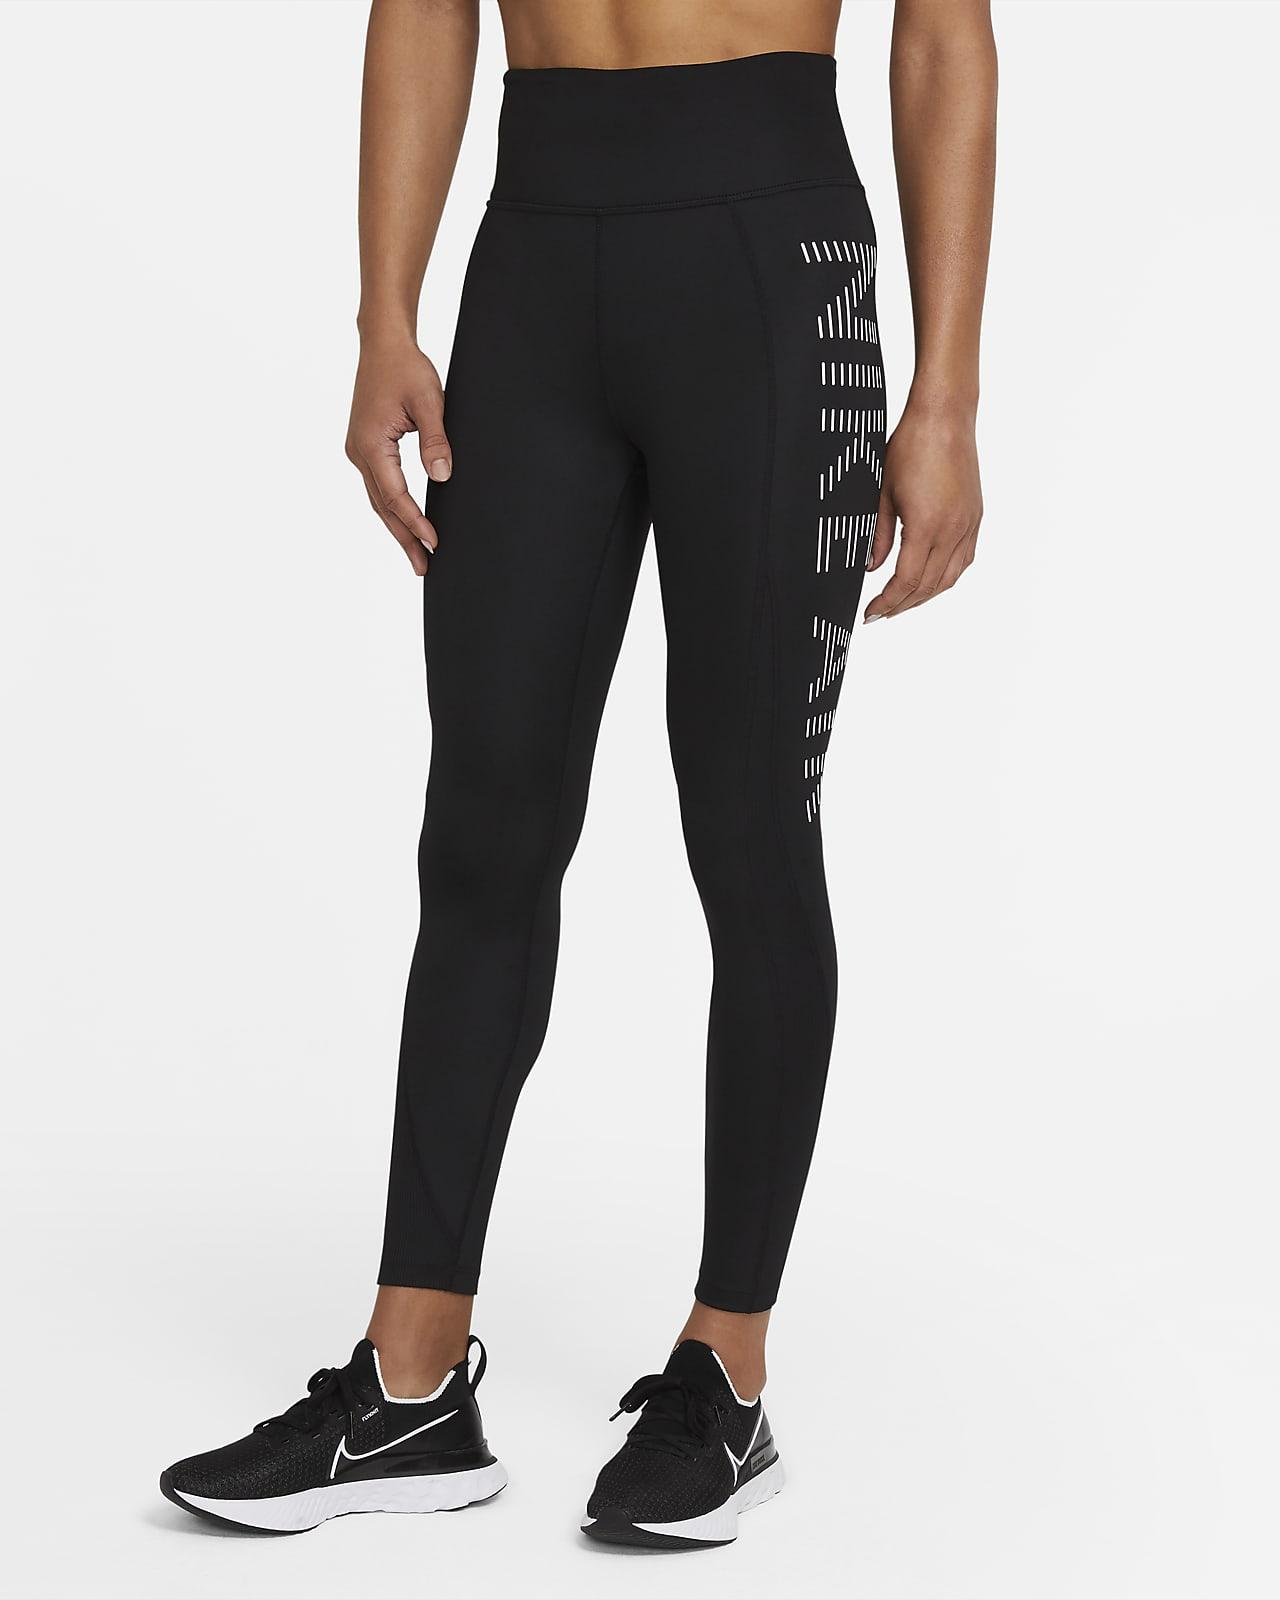 Damskie legginsy 7/8 do biegania Nike Air Epic Fast